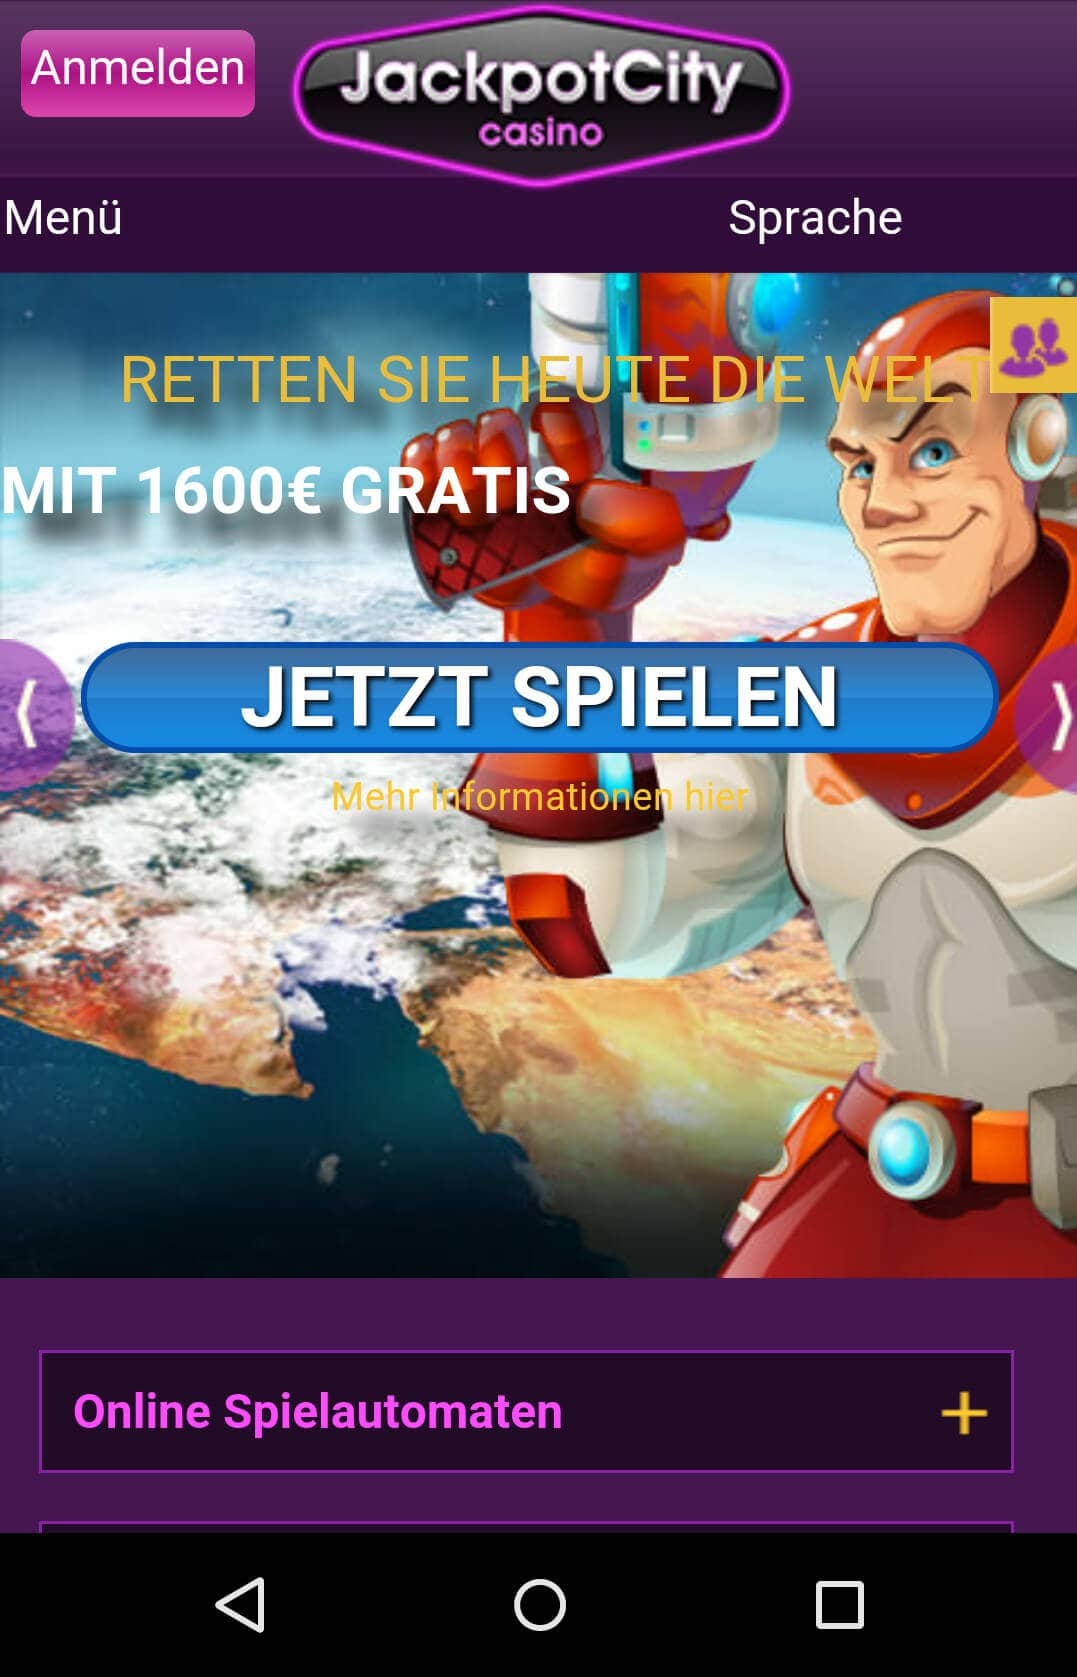 jackpotcity mobile casino ipad